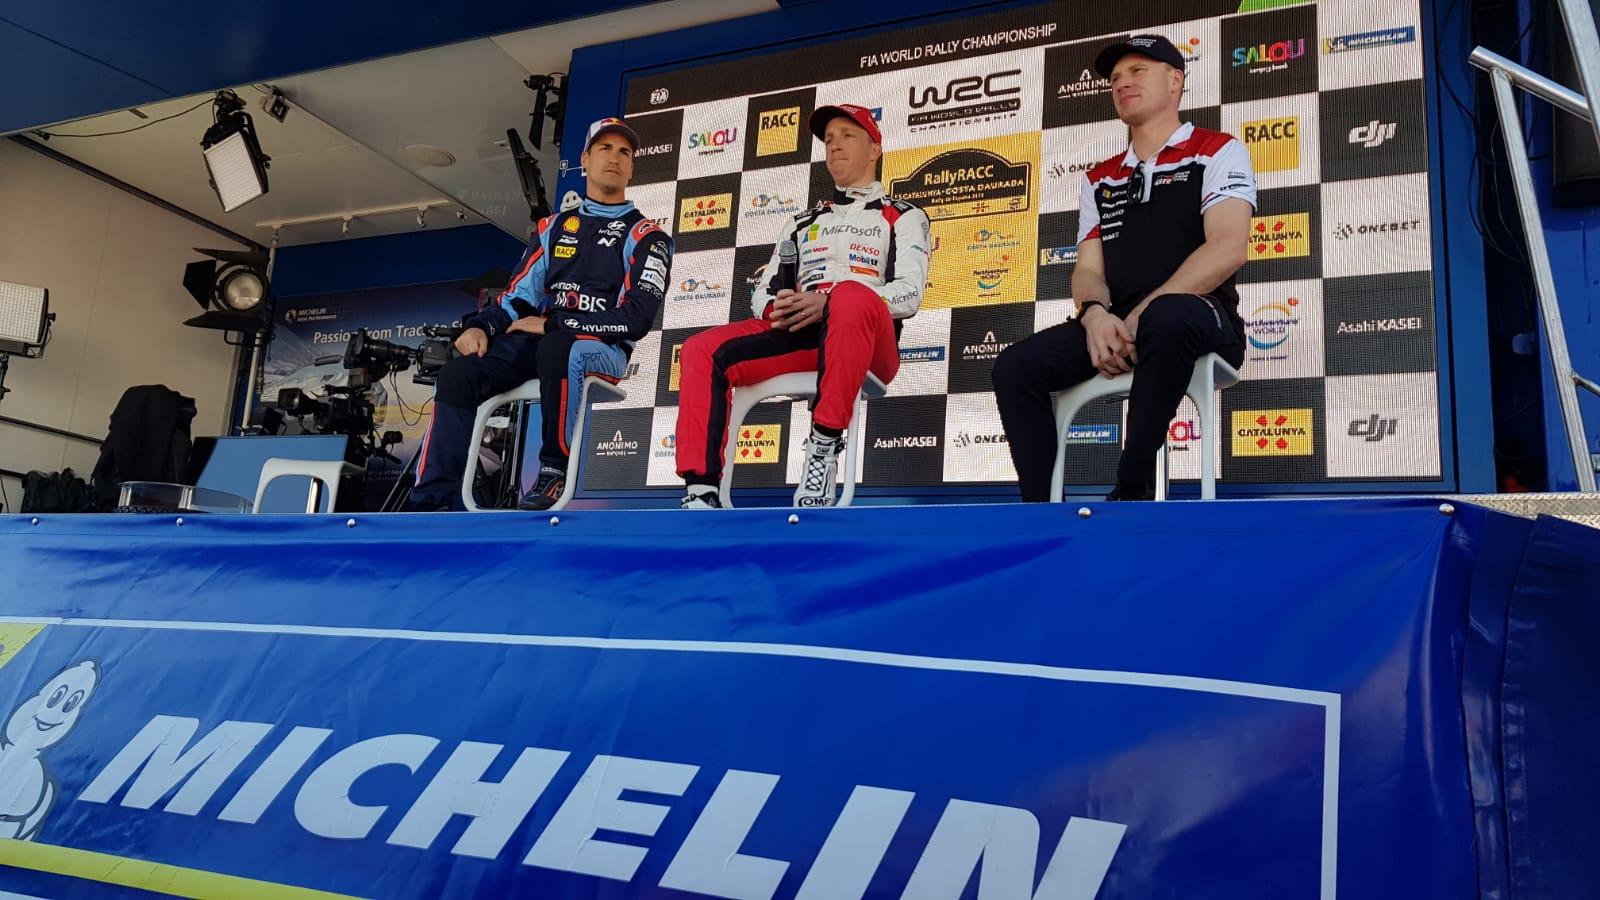 WRC: 55º RallyRACC Catalunya - Costa Daurada - Rally de España [24-27 Octubre] - Página 5 EHo-Q-yWsAAXp2P?format=jpg&name=large